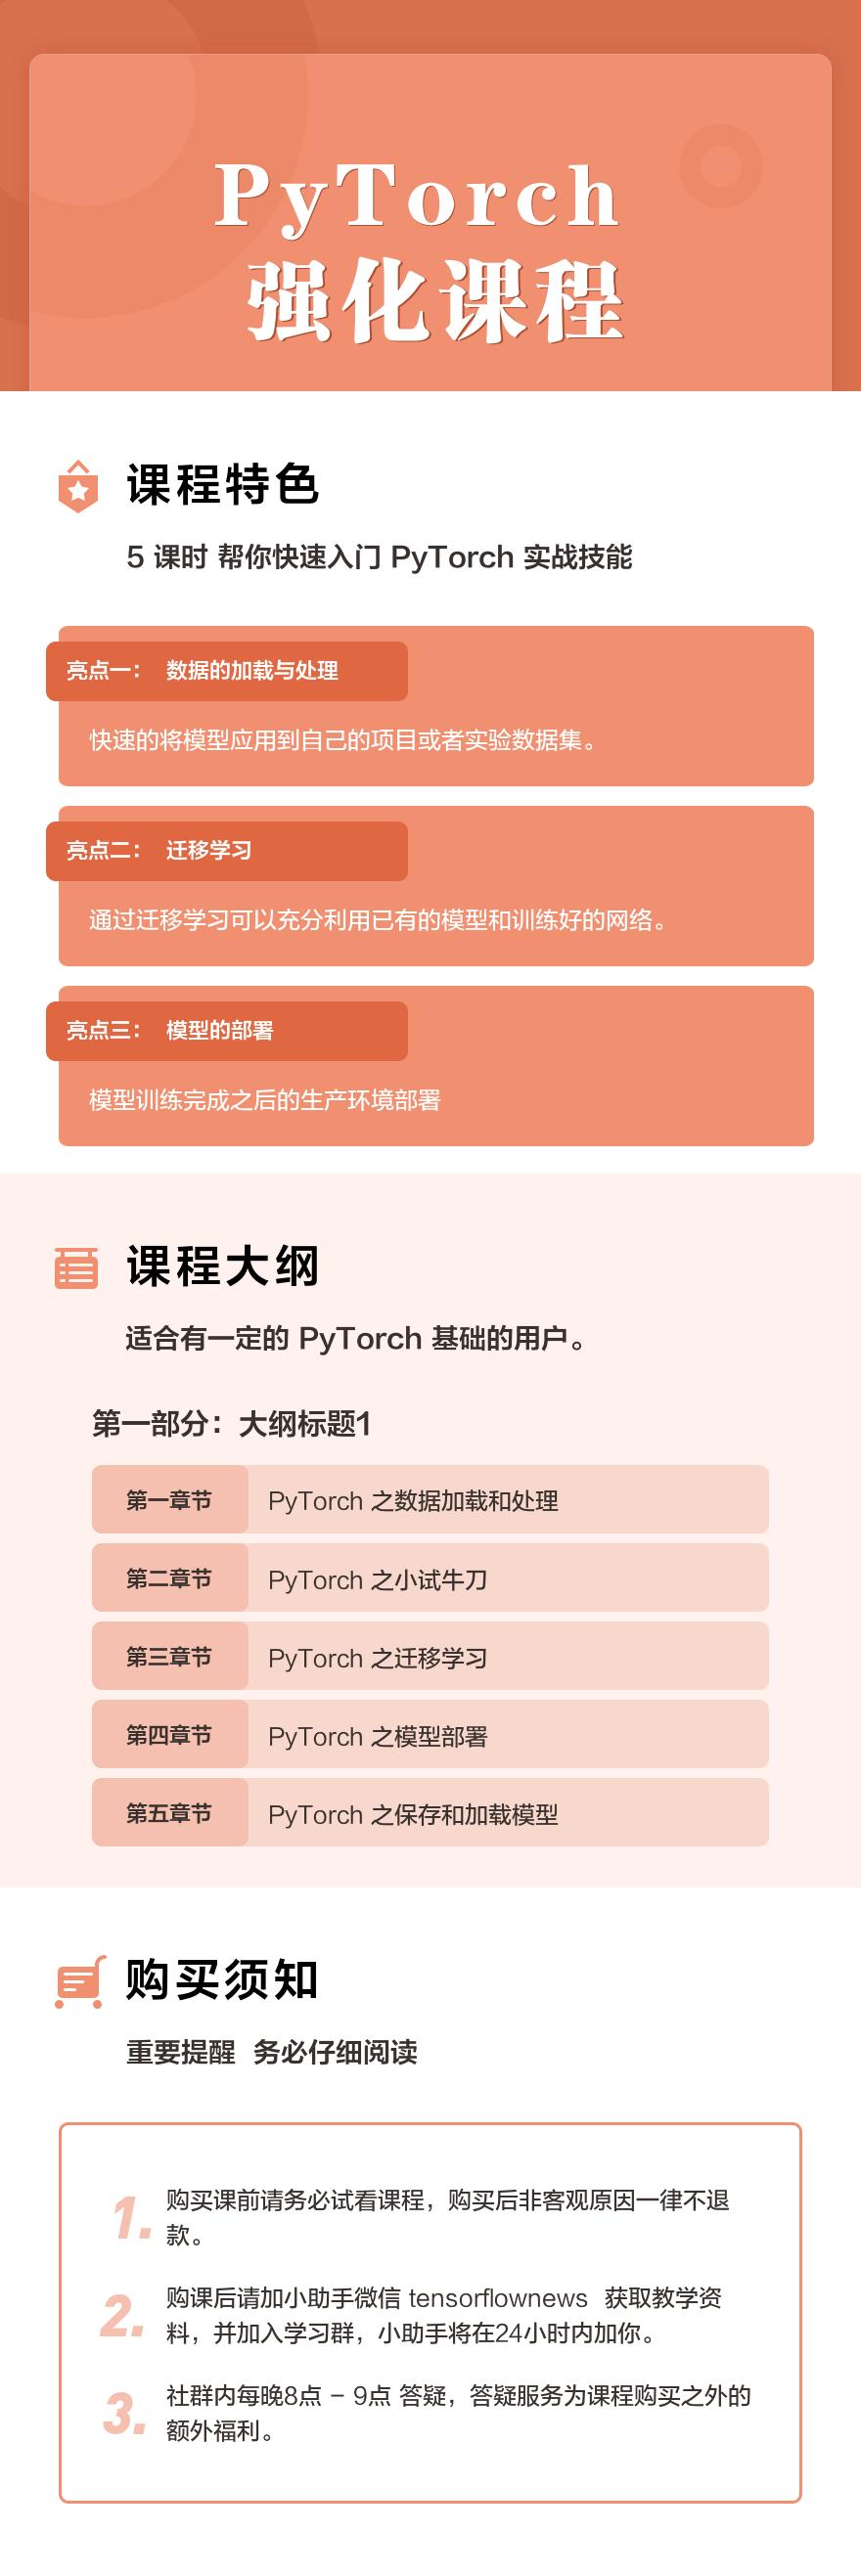 PyTorch 强化课程,手把手带你敲 PyTorch